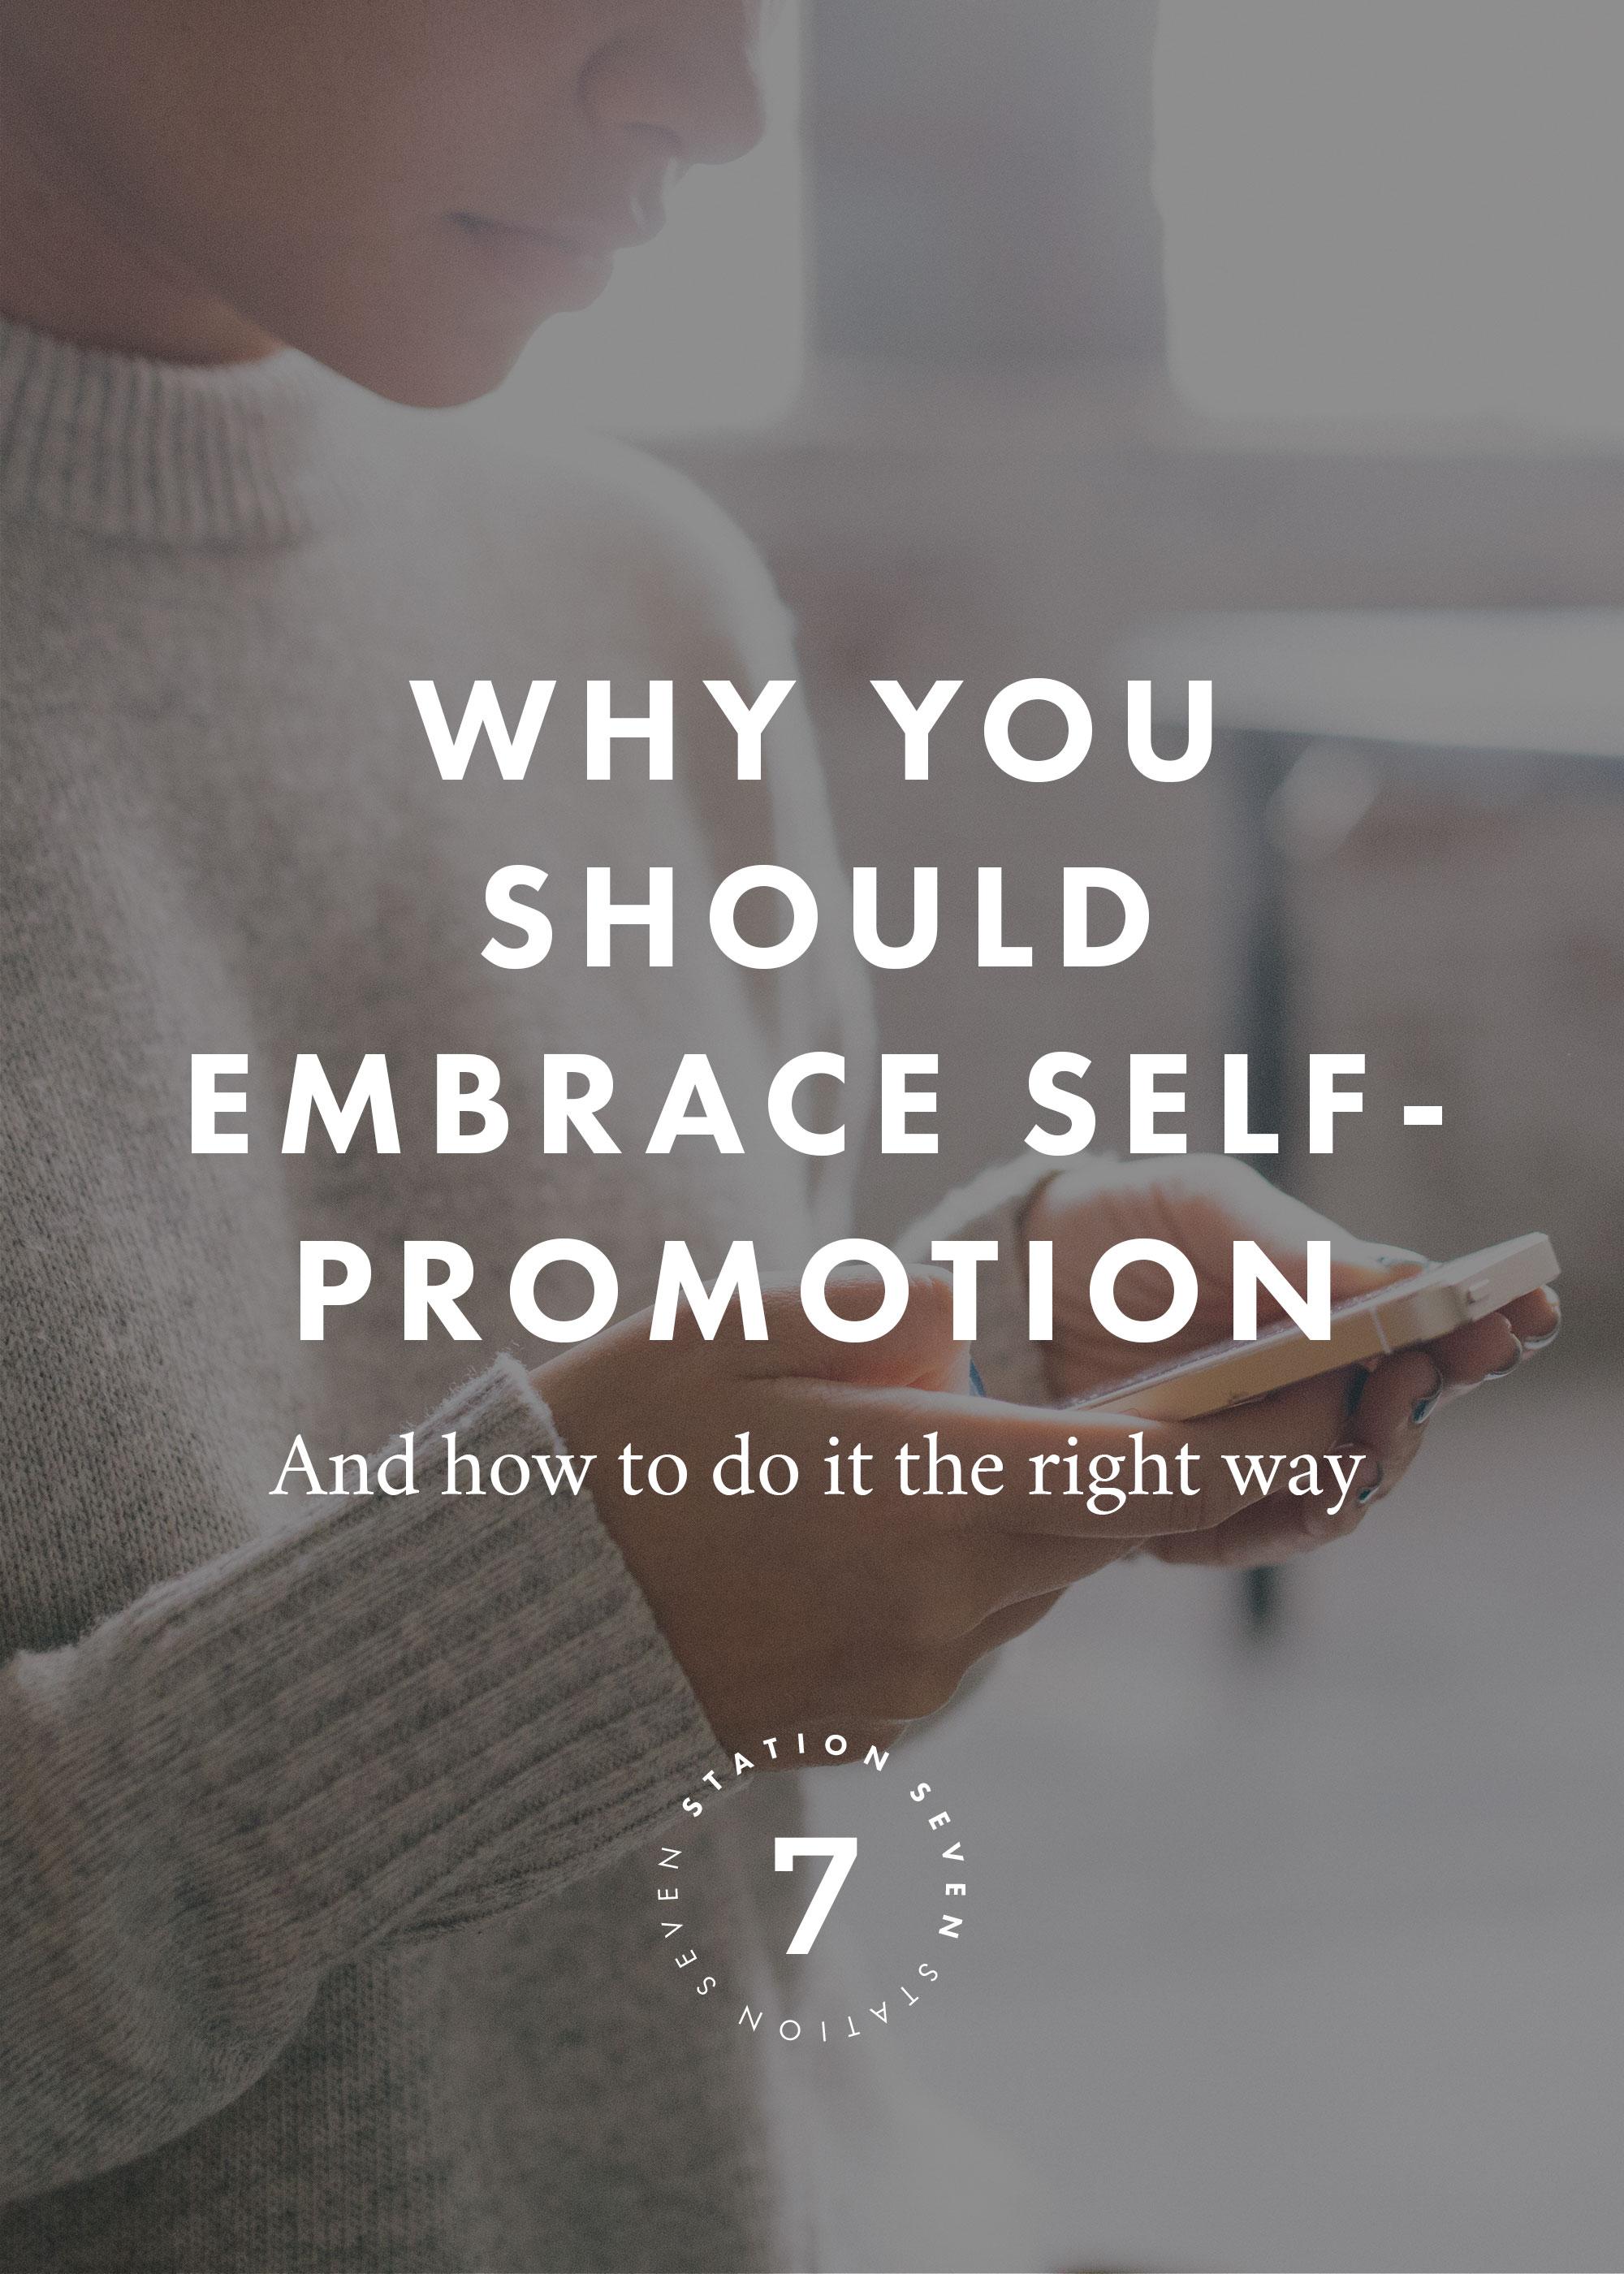 Why You Should Embrace Self-Promotion.jpeg